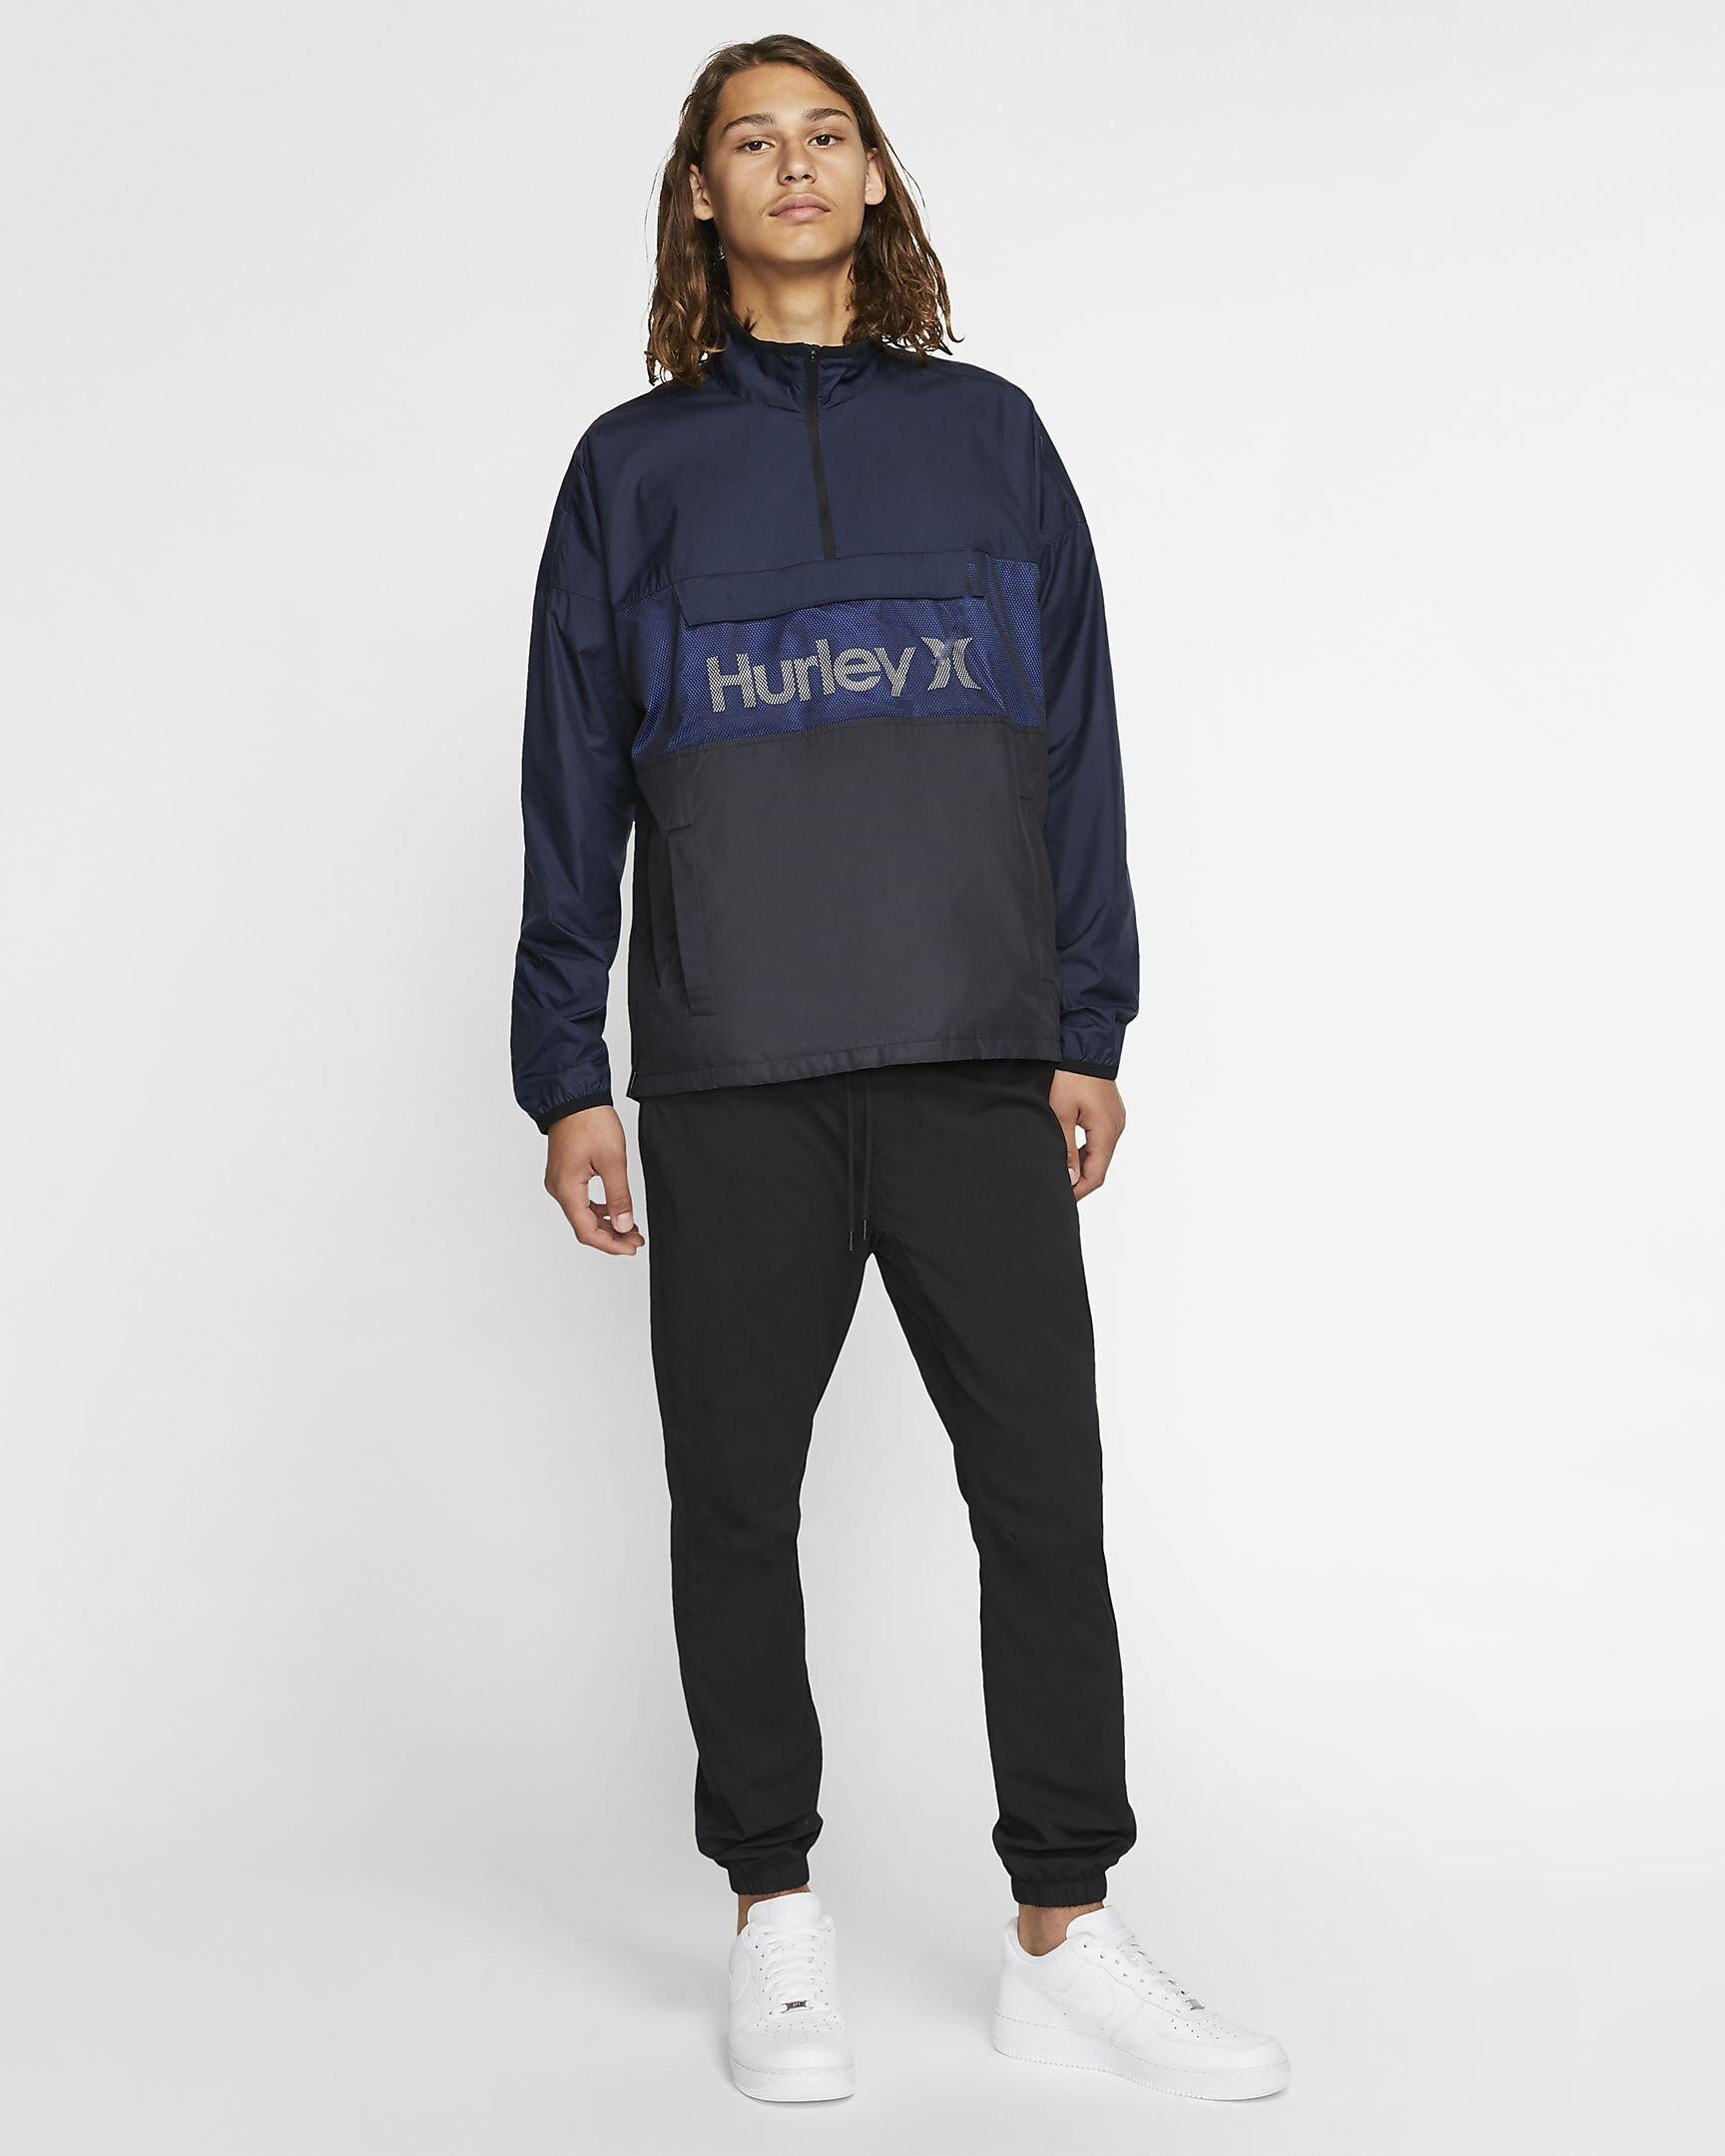 hurley-siege-anorak-mens-jacket-KVw8DS.jpg